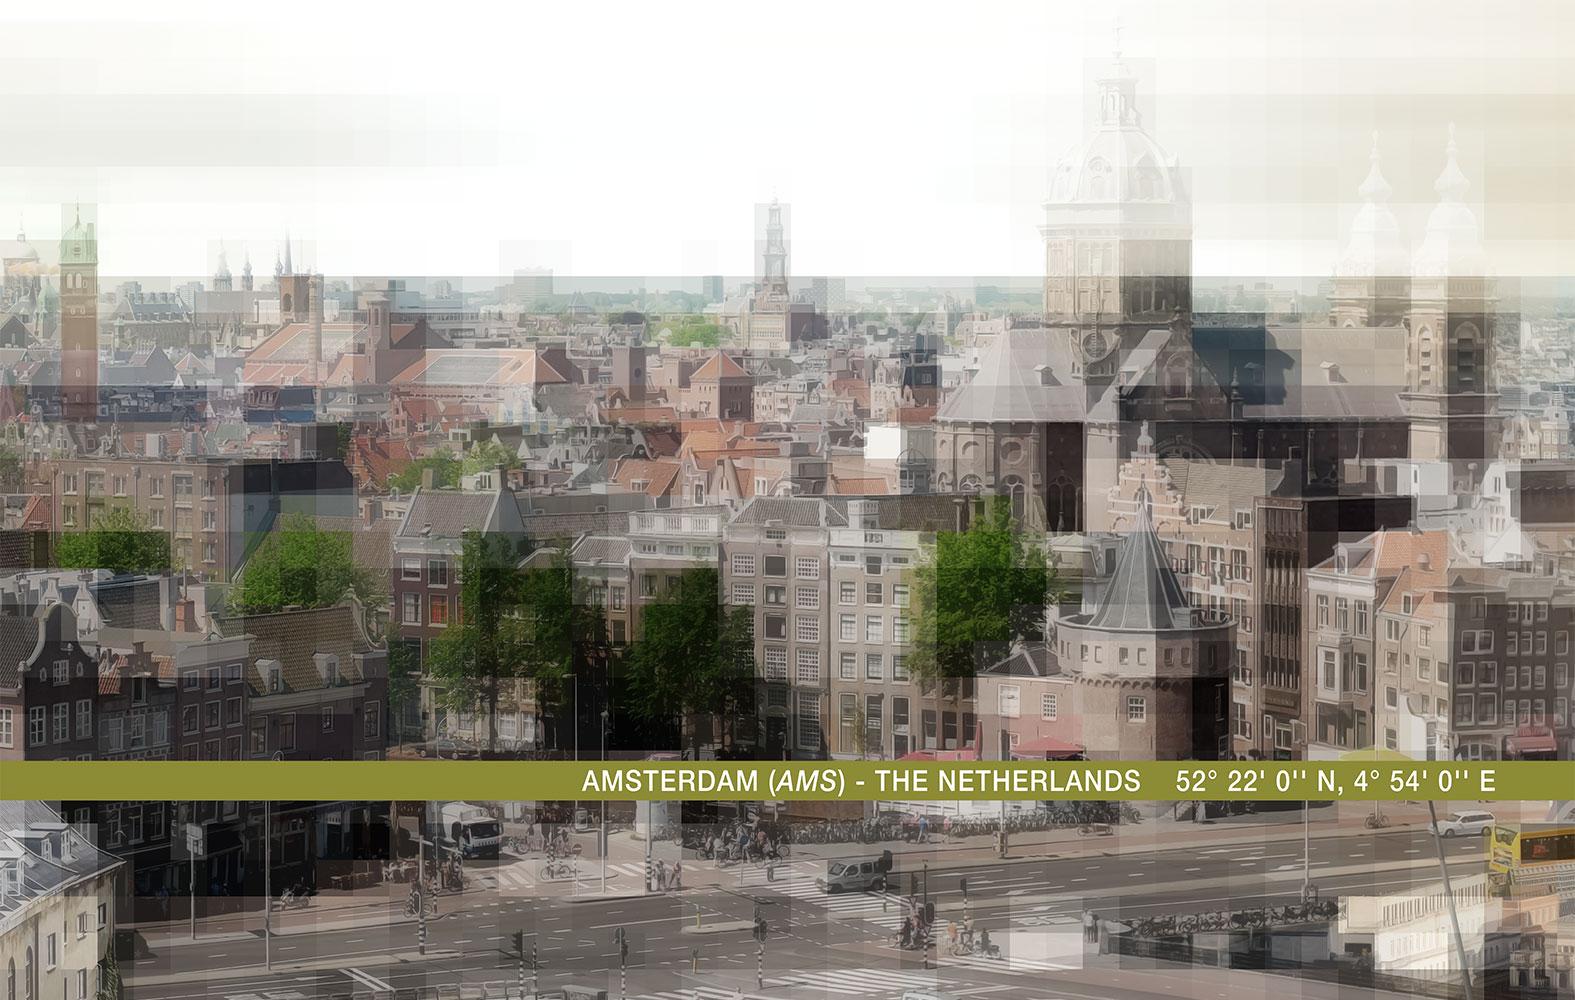 StudioErnst-HMShost-cityscapes-amsterdam2